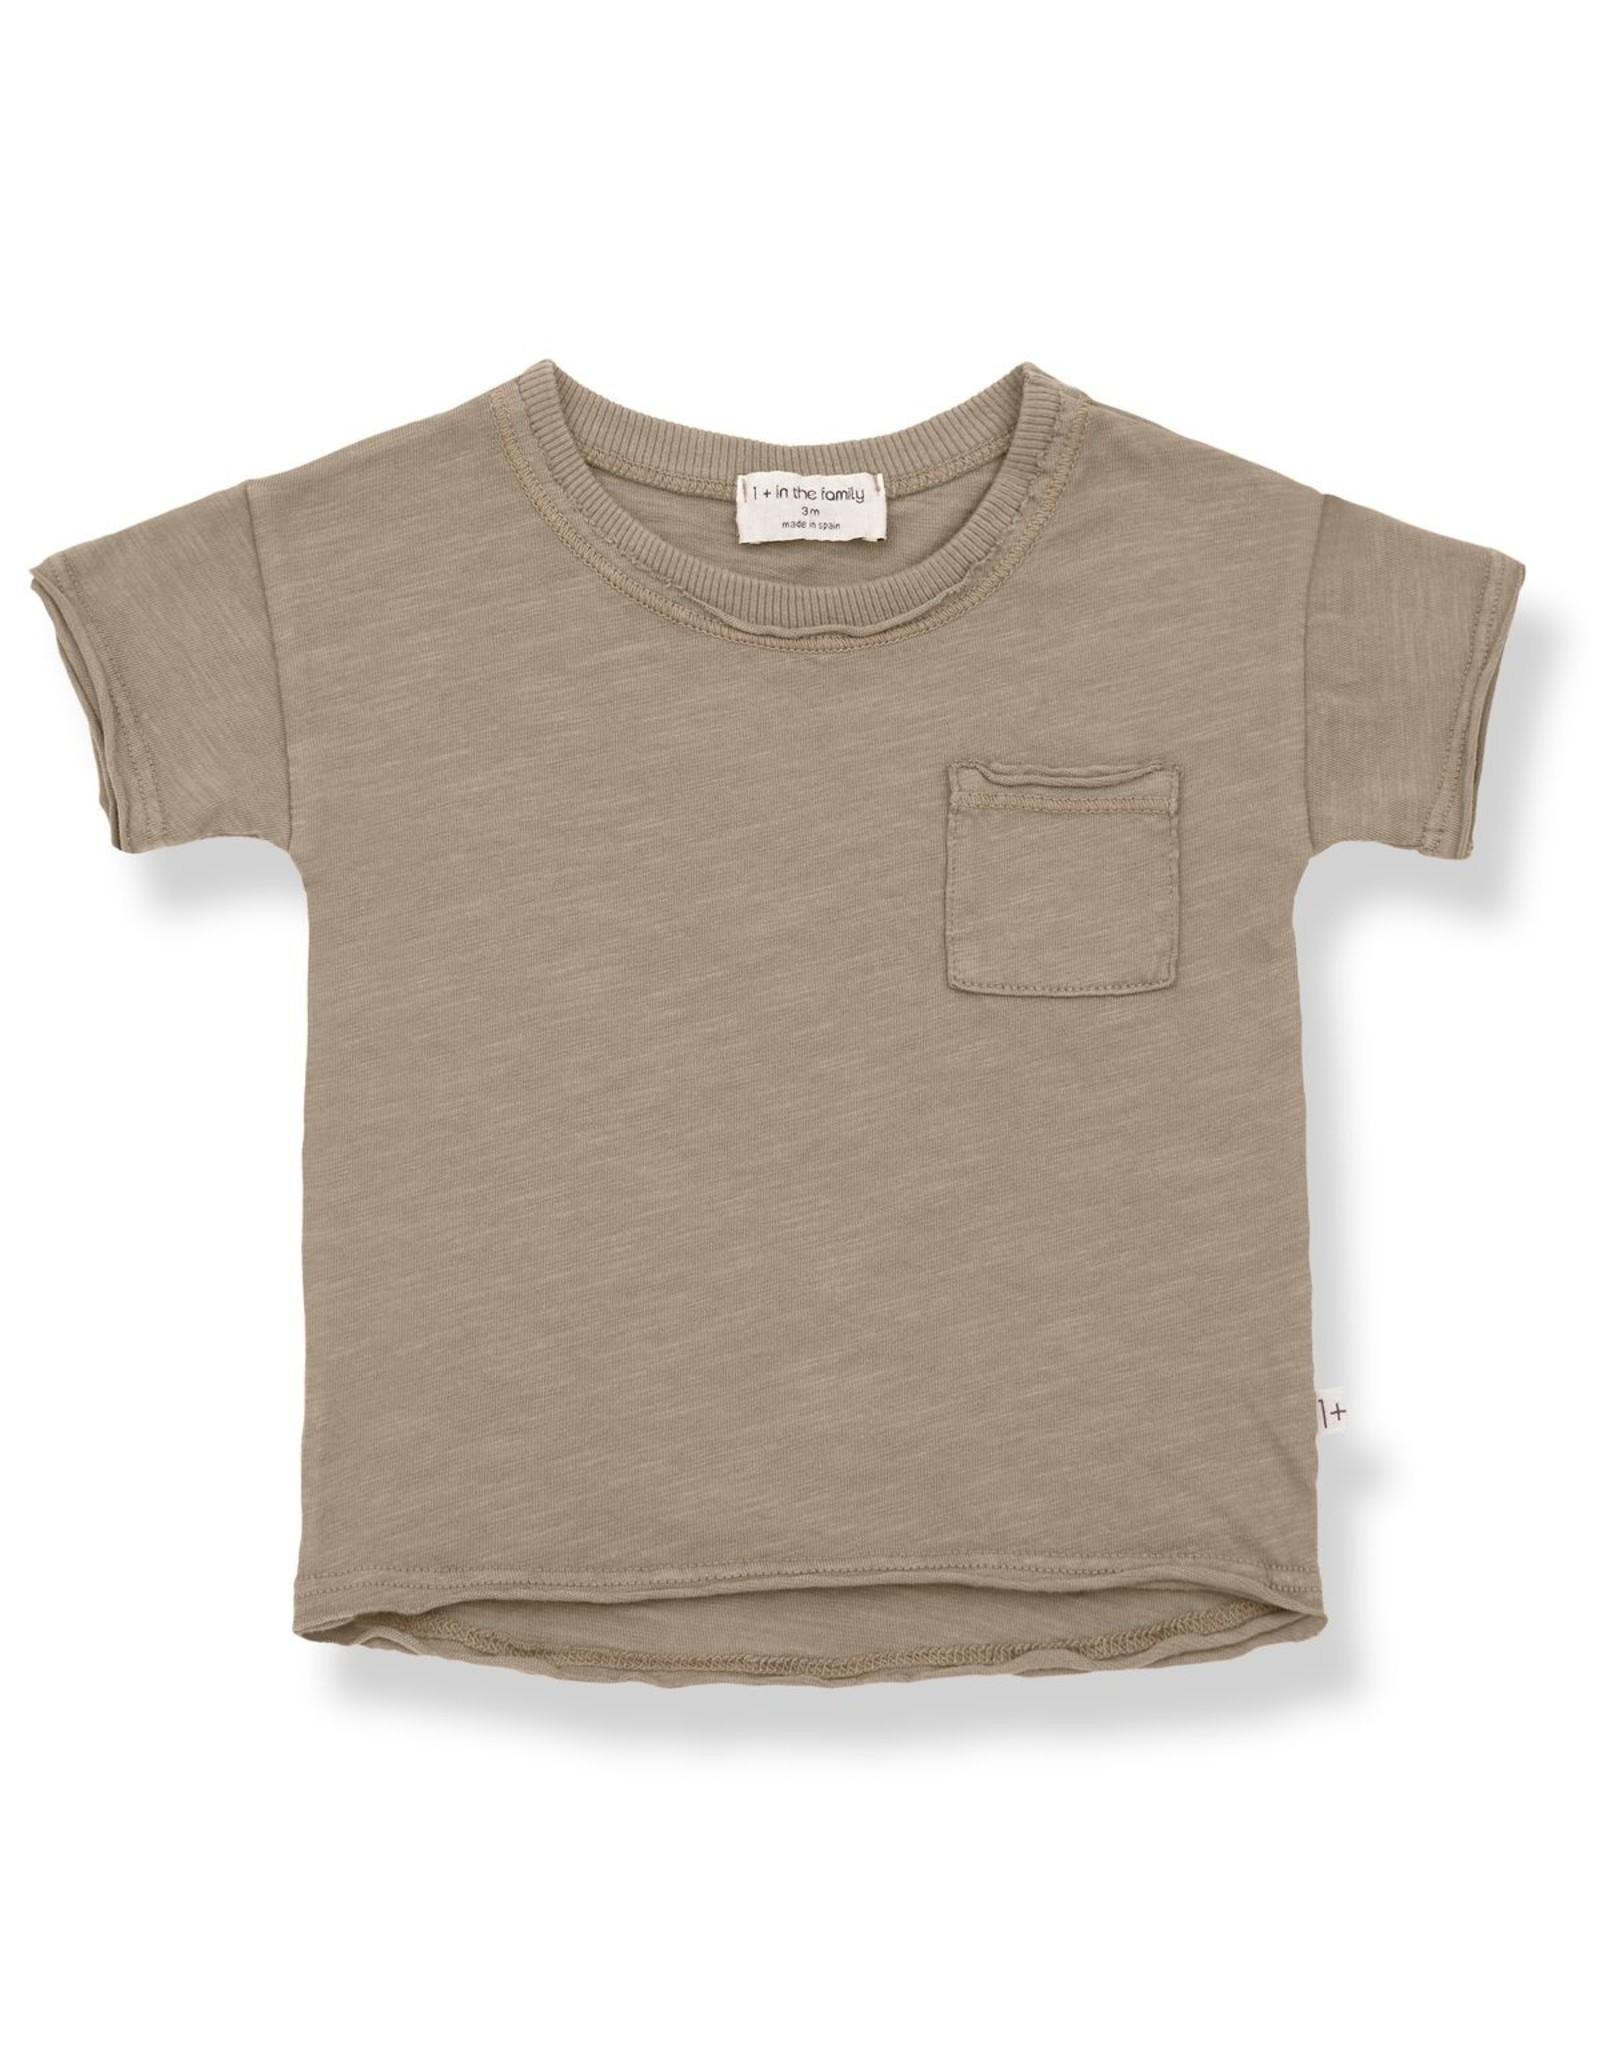 1+ In The Family 1+ in the Family NANI t-shirt khaki